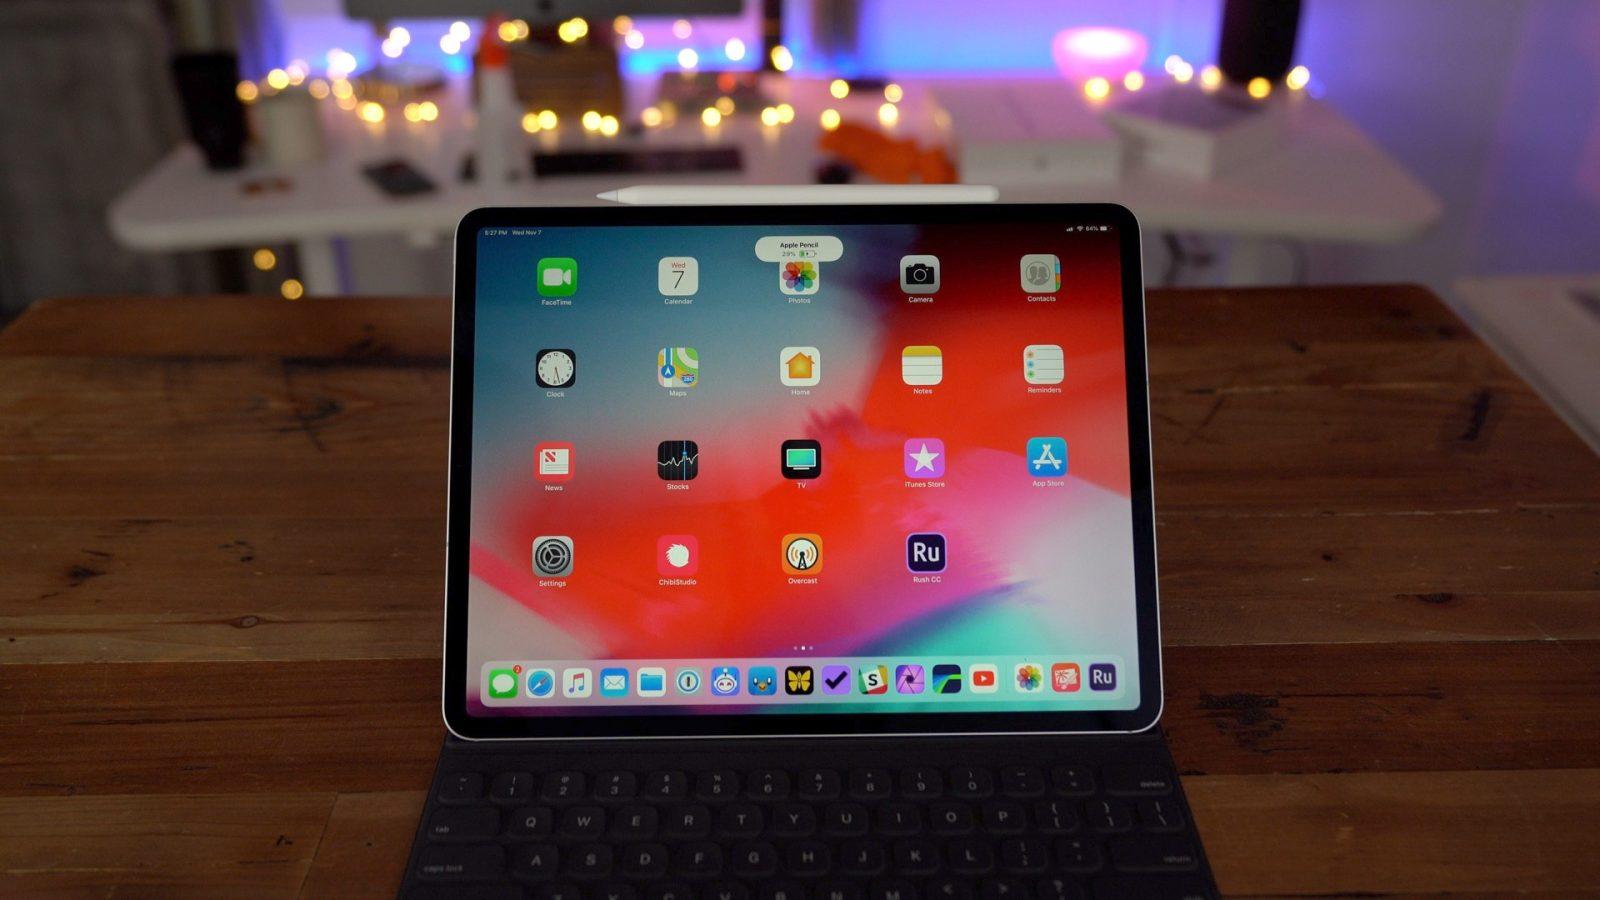 Apple warns iPad Pro users of Apple Pencil key fob